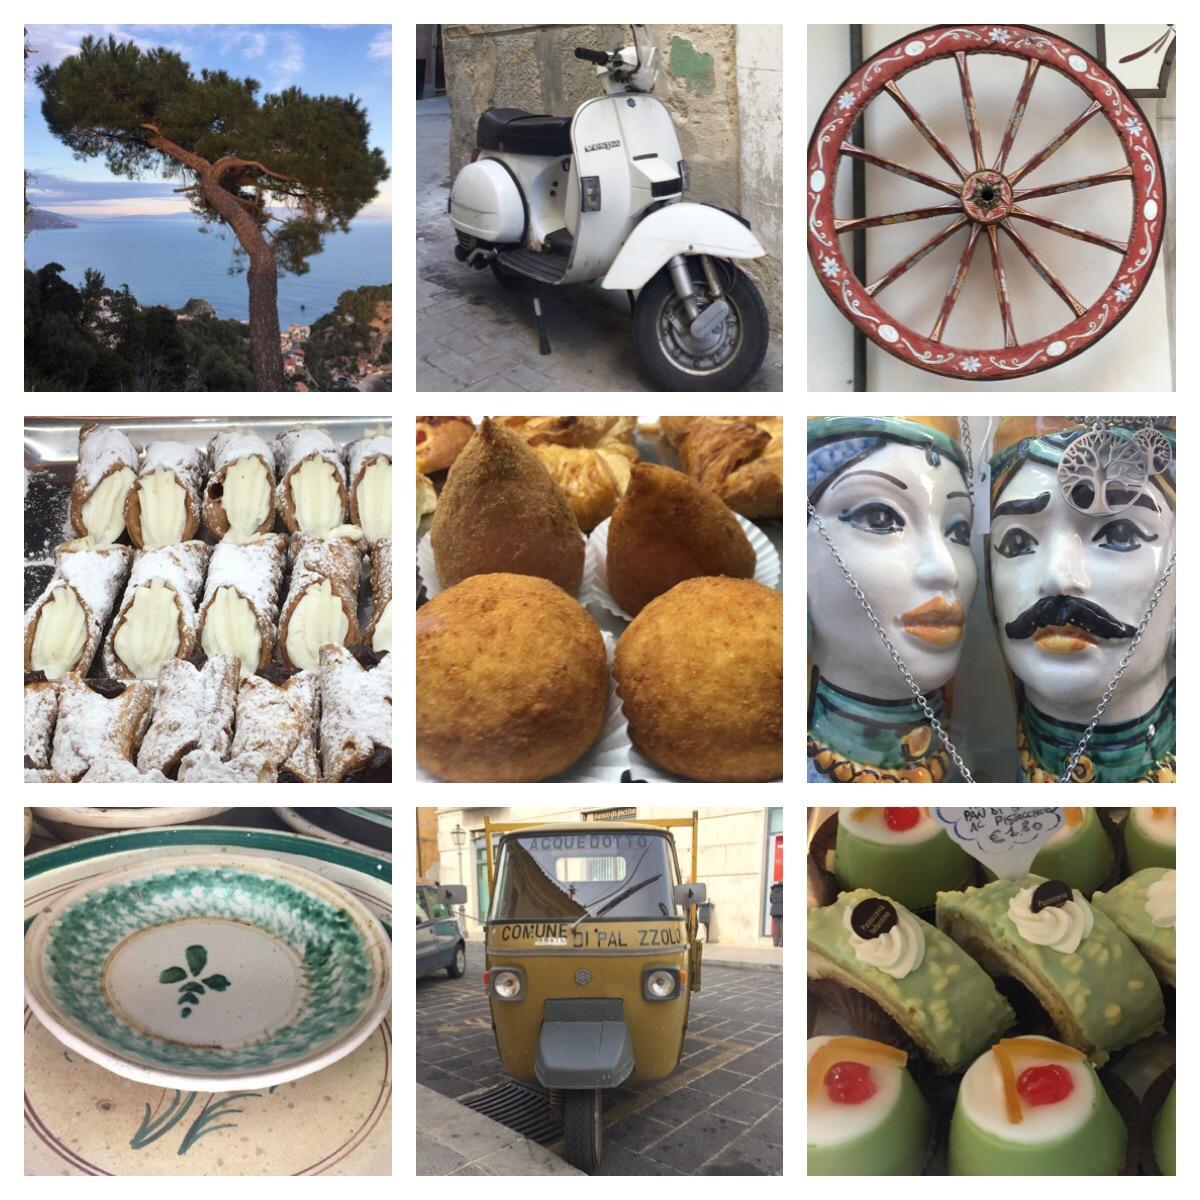 De oostkant van Sicilië